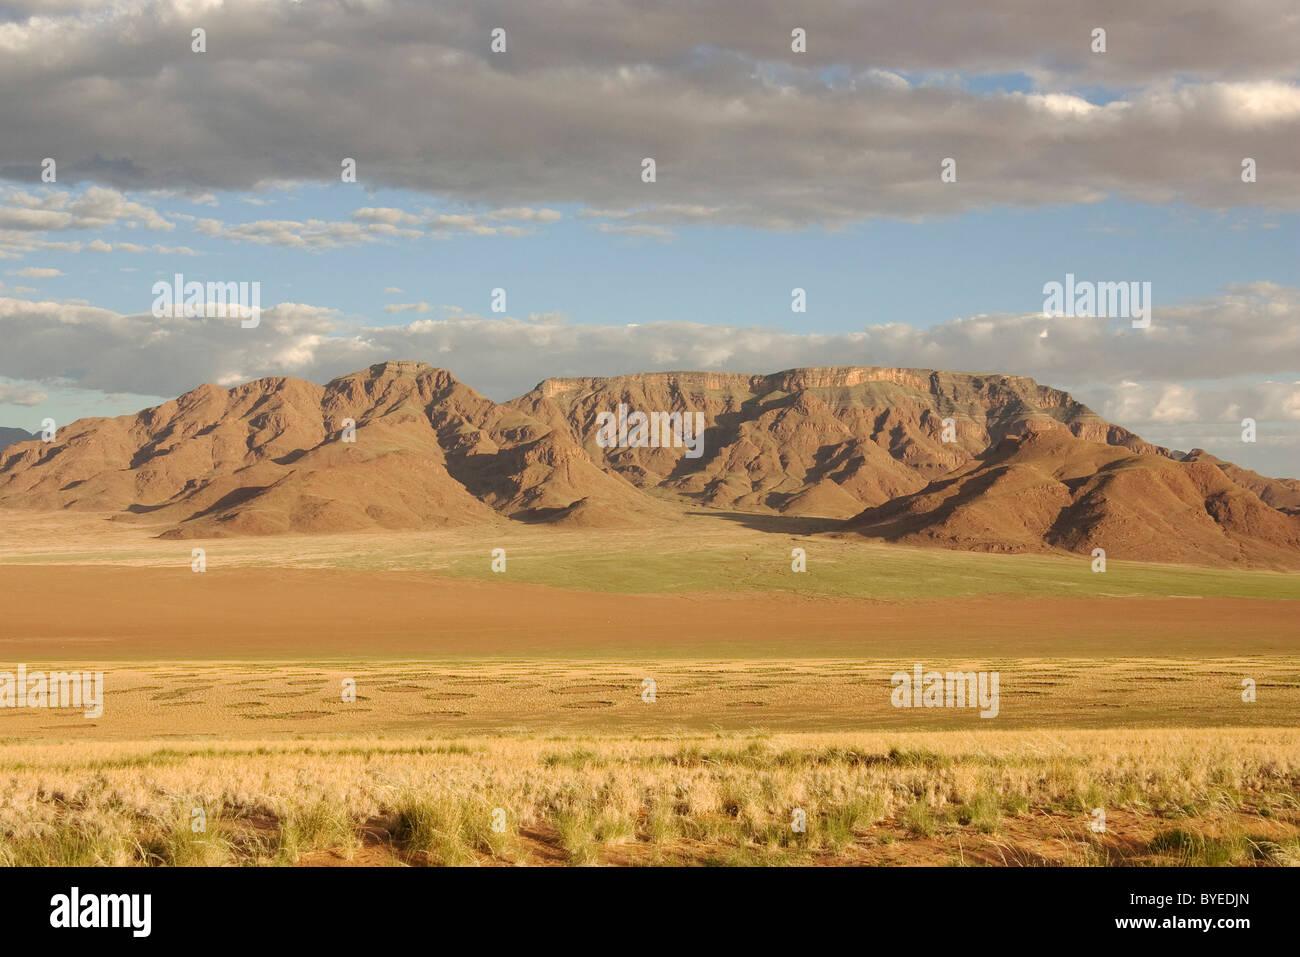 NamibRand Nature Reserve during the rainy season with green vegetation at the edge of the Namib Desert - Stock Image